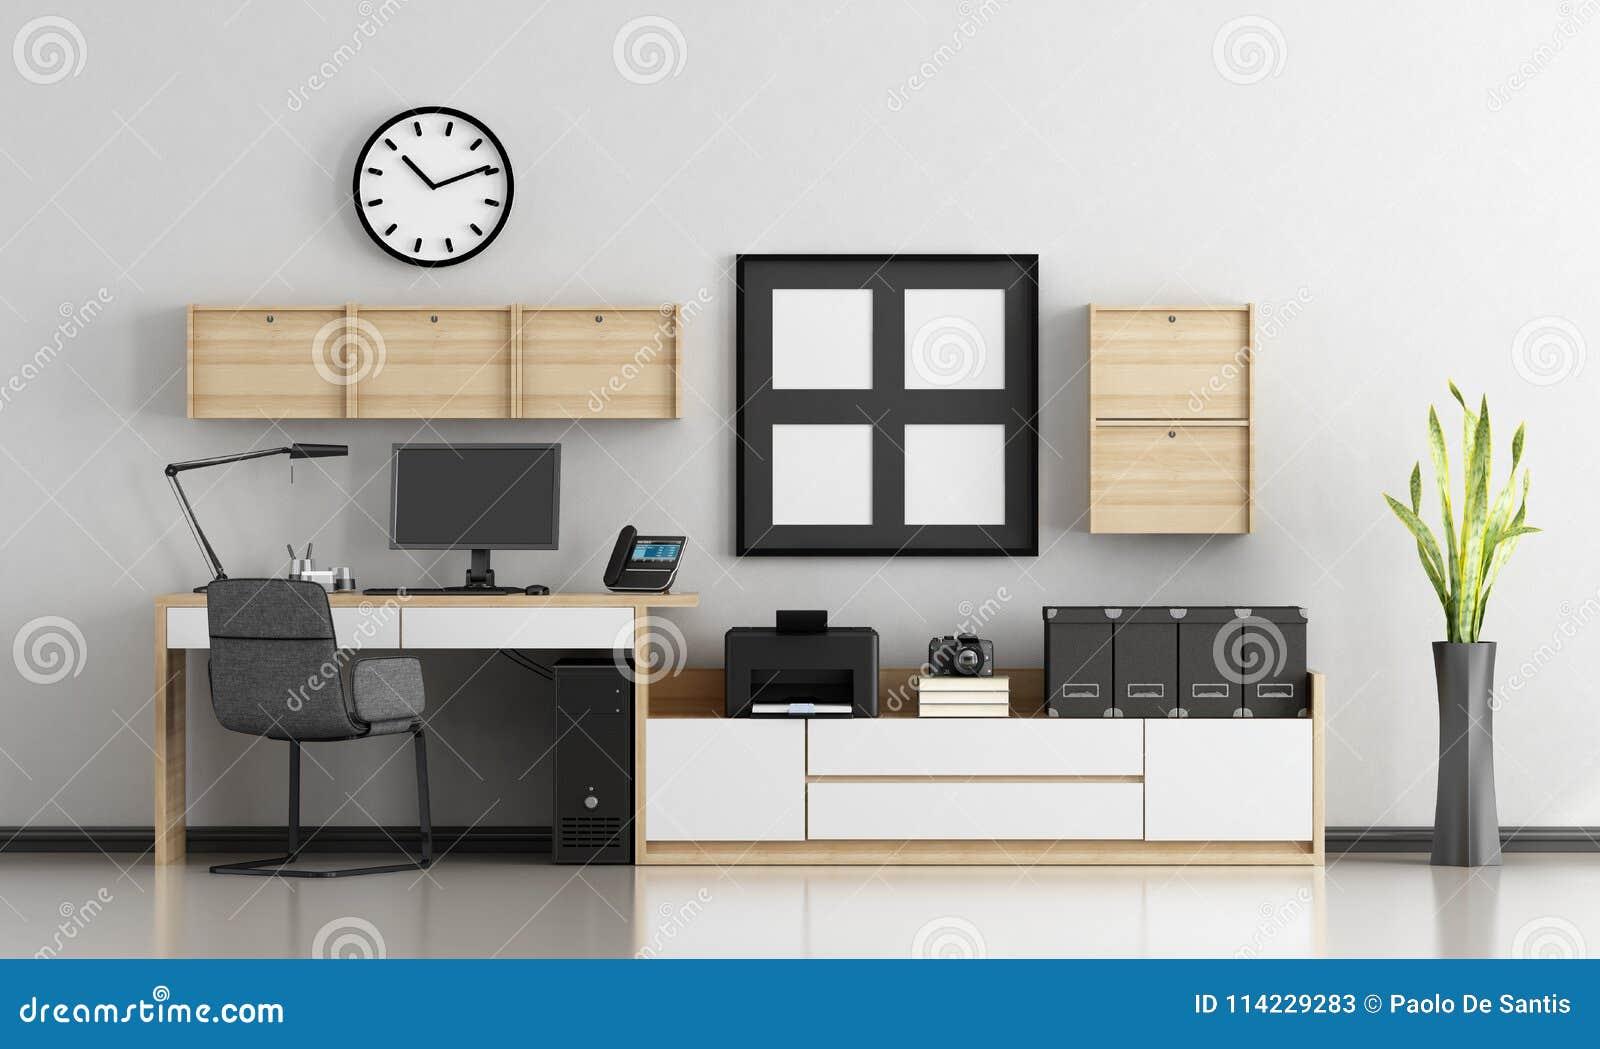 Minimalist home workplace stock illustration. Illustration of office ...